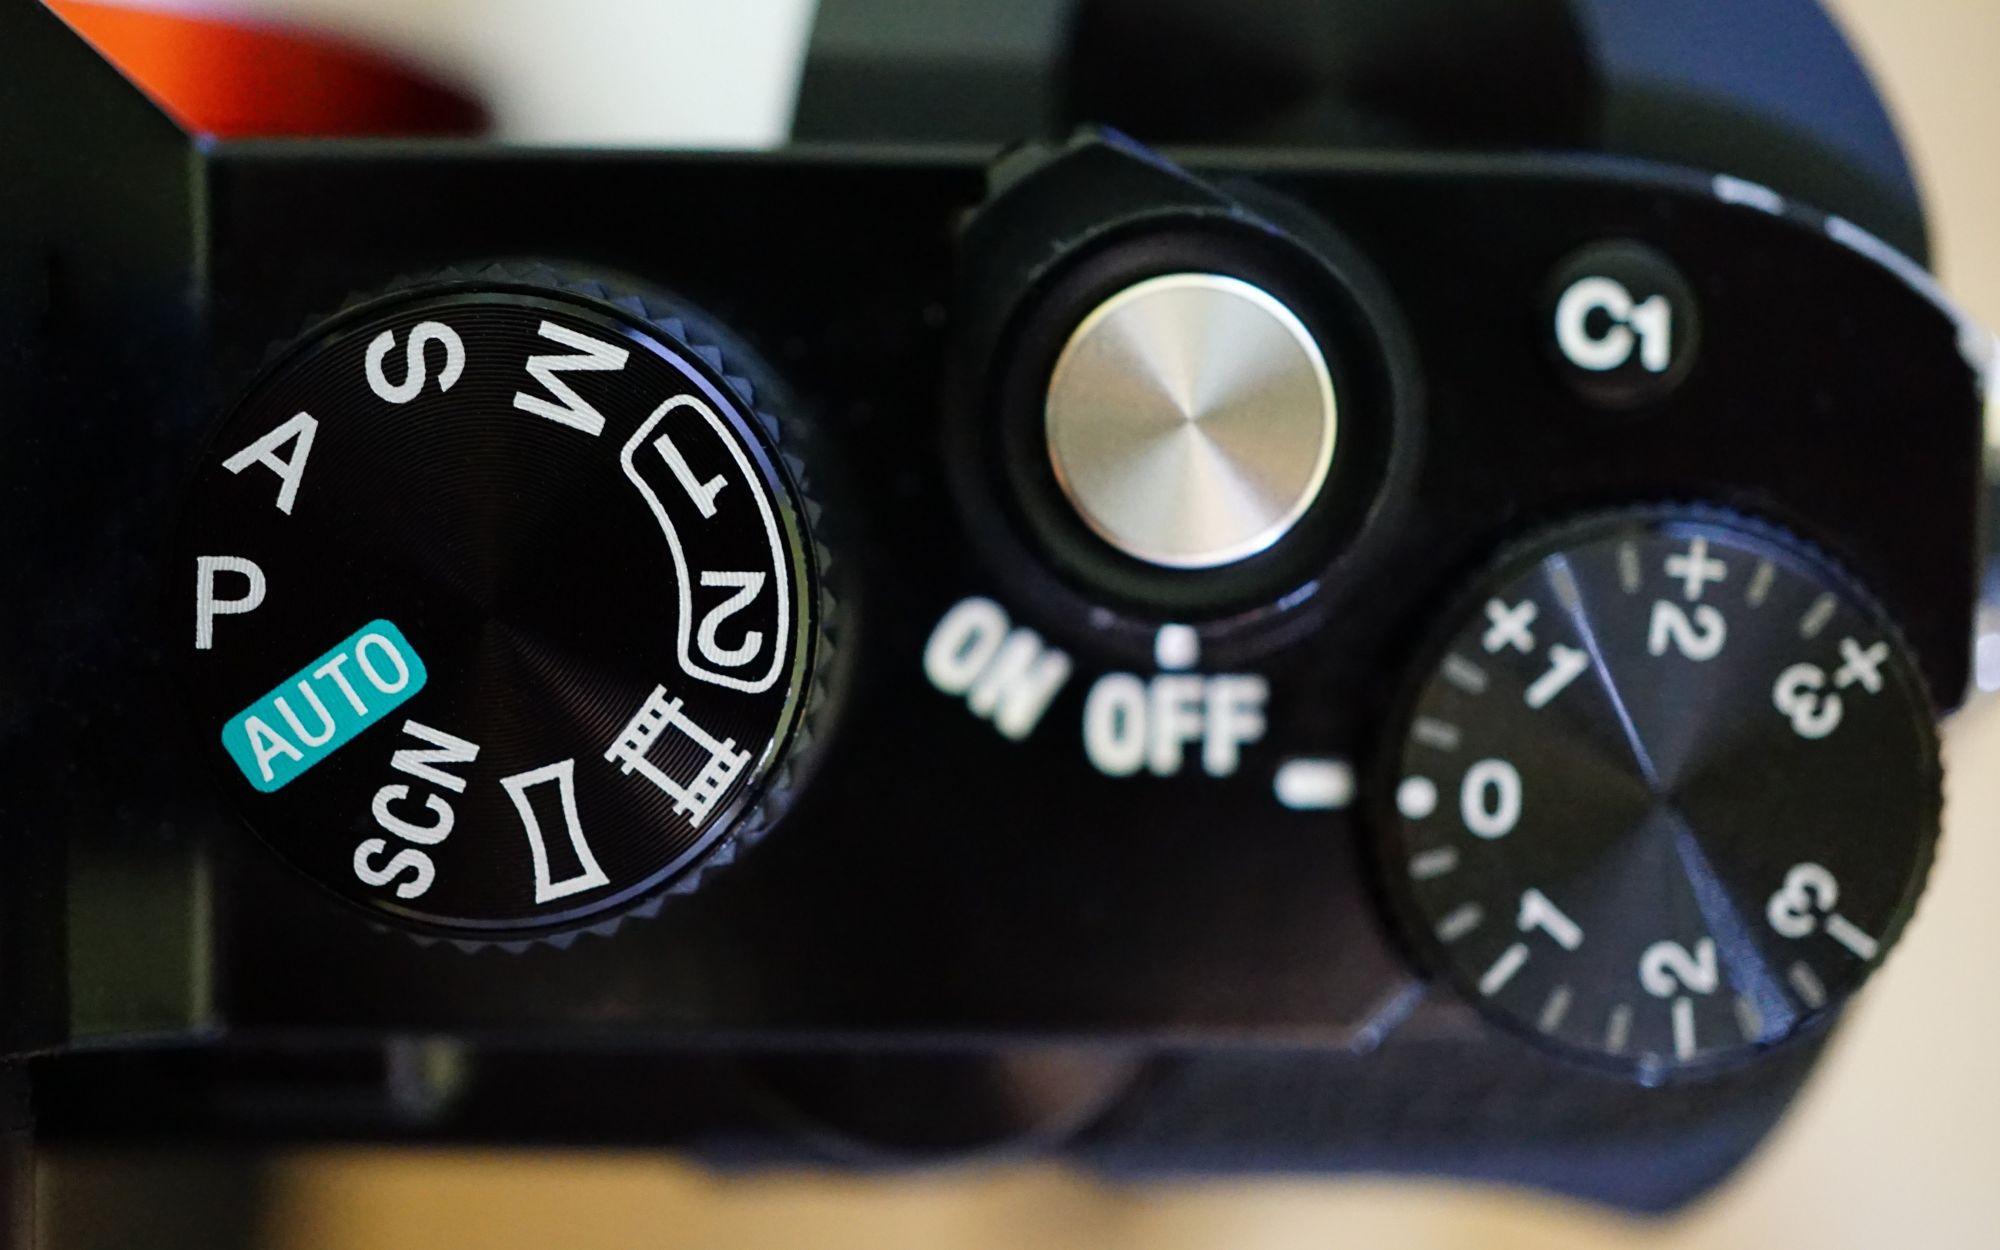 Your Camera's Manual Settings